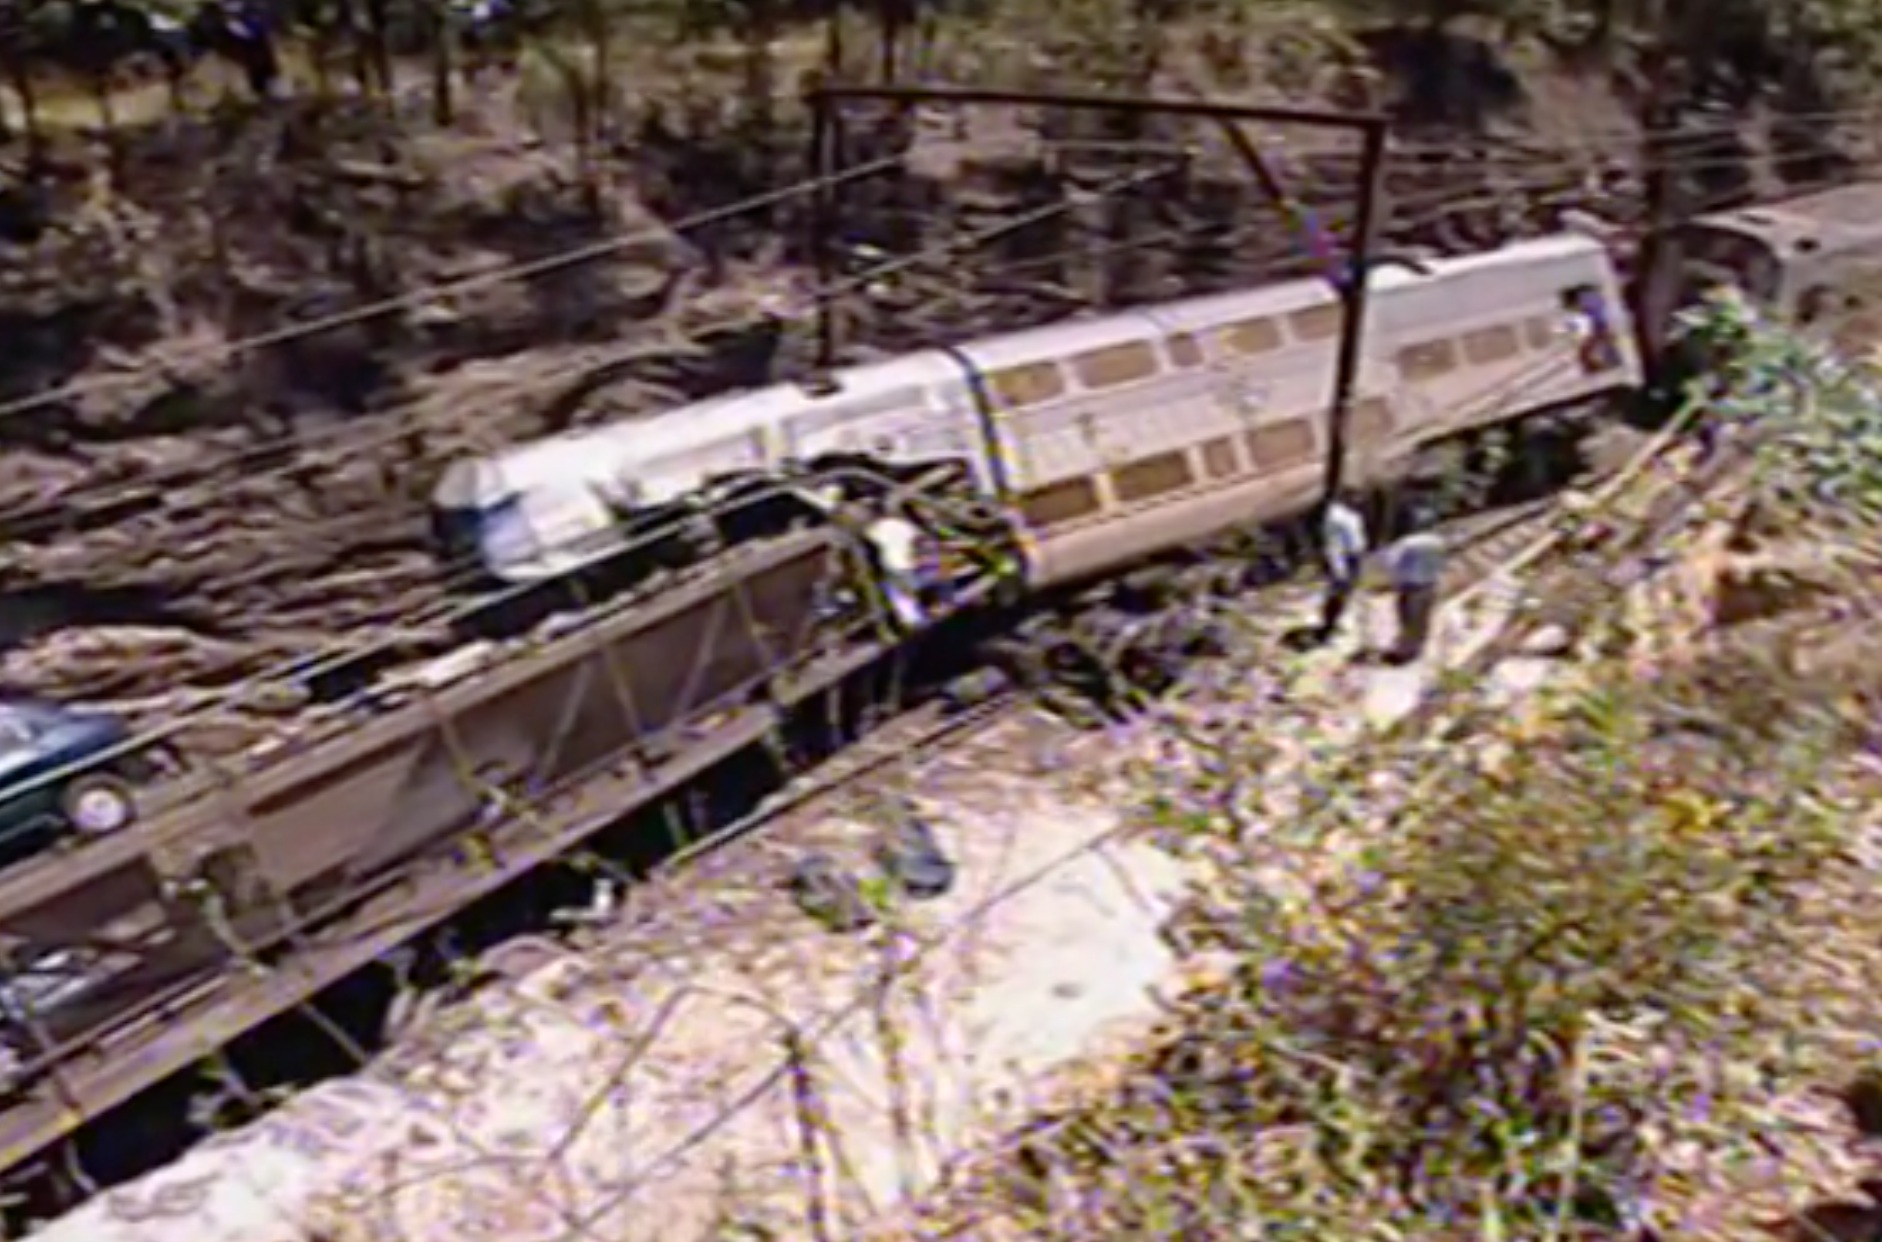 Glenbrook rail accident - Wikipedia